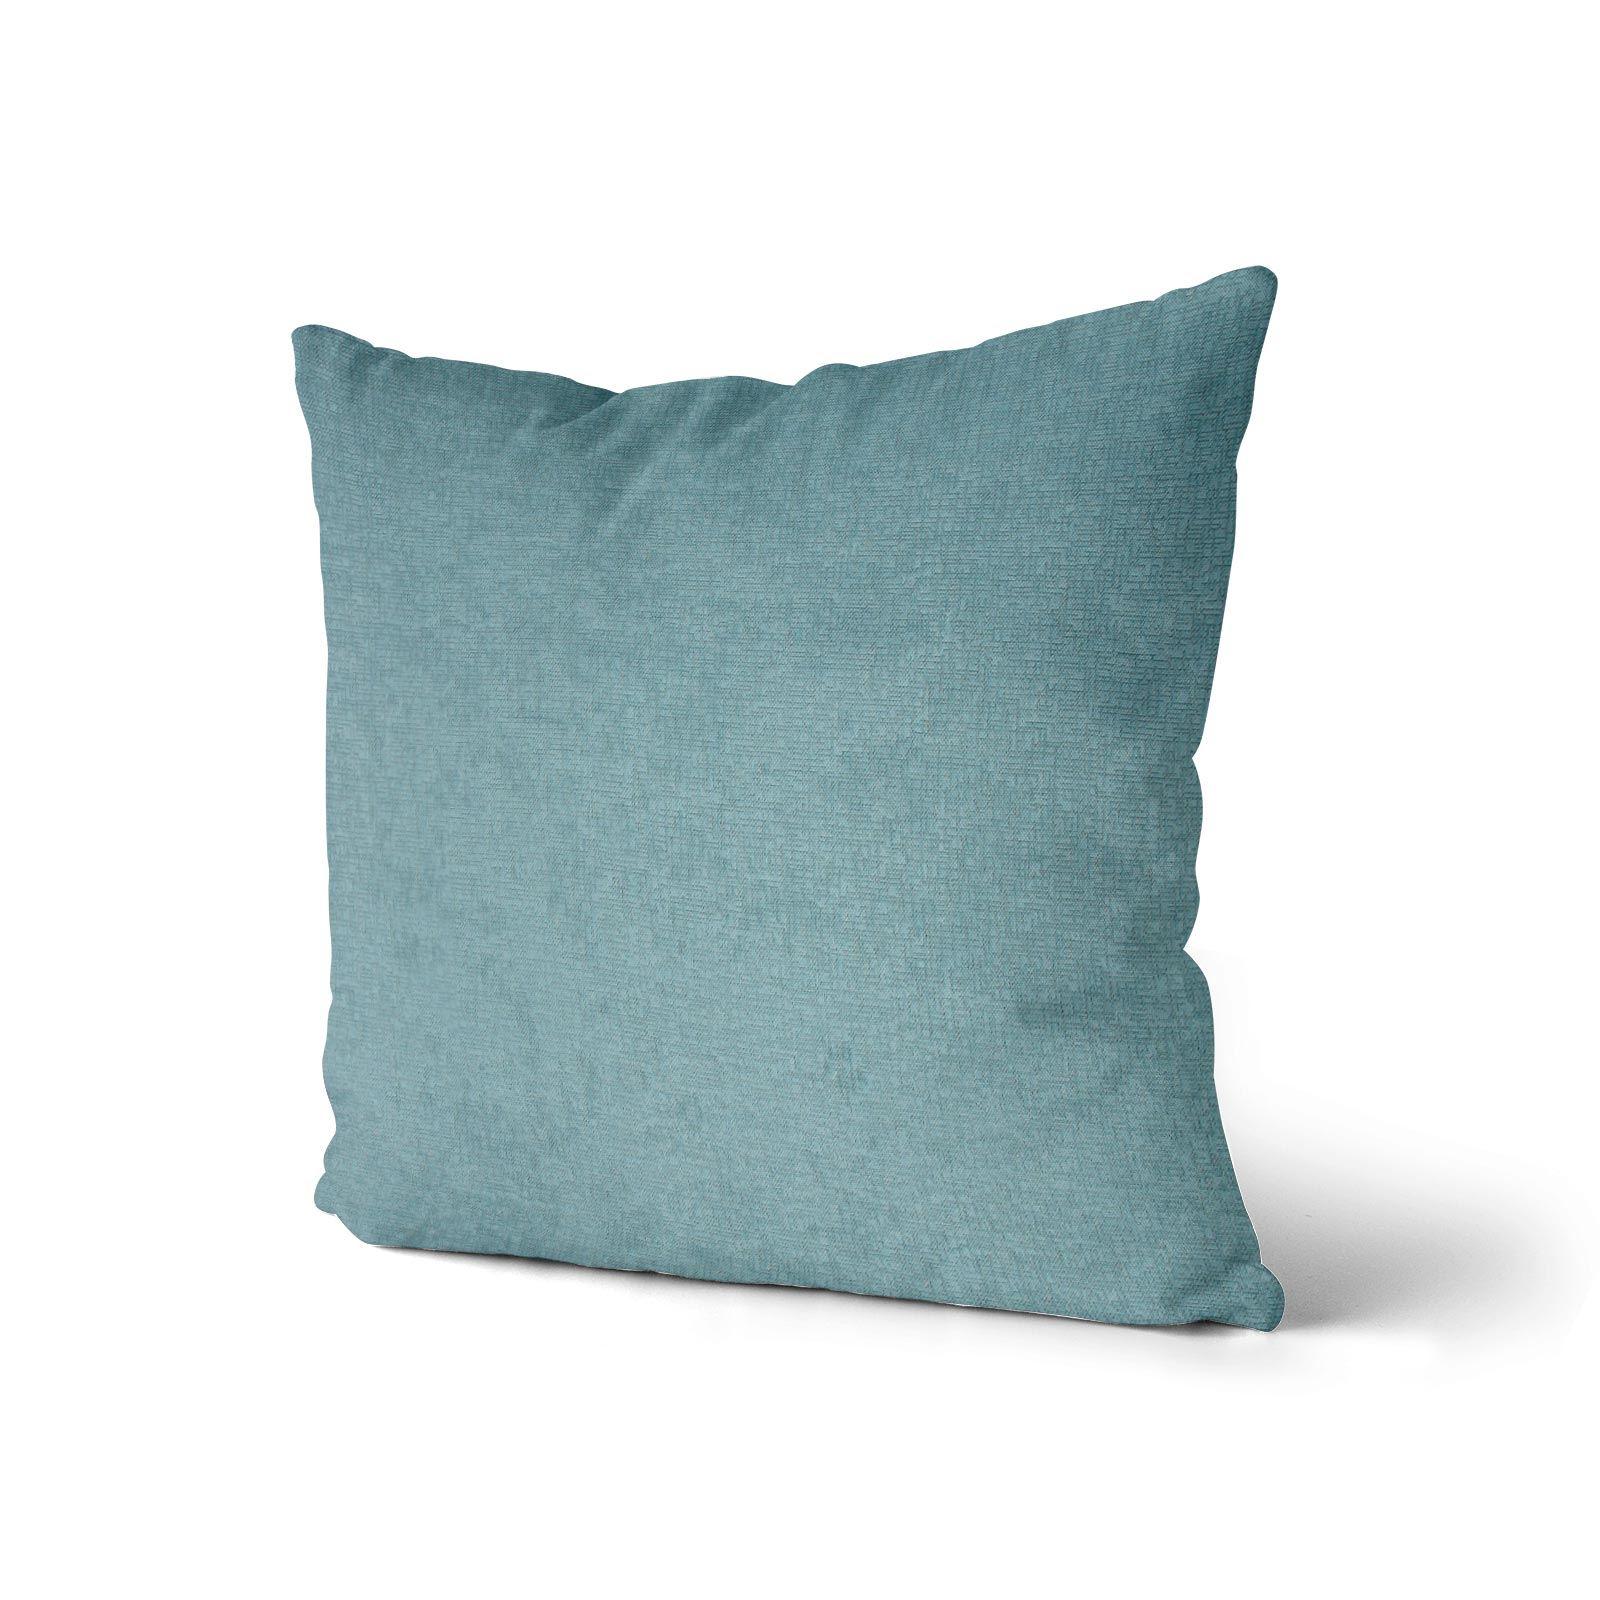 Teal-Blue-Duck-Egg-Cushion-Covers-18-034-x18-034-45cm-x-45cm-Luxury-Cover thumbnail 11